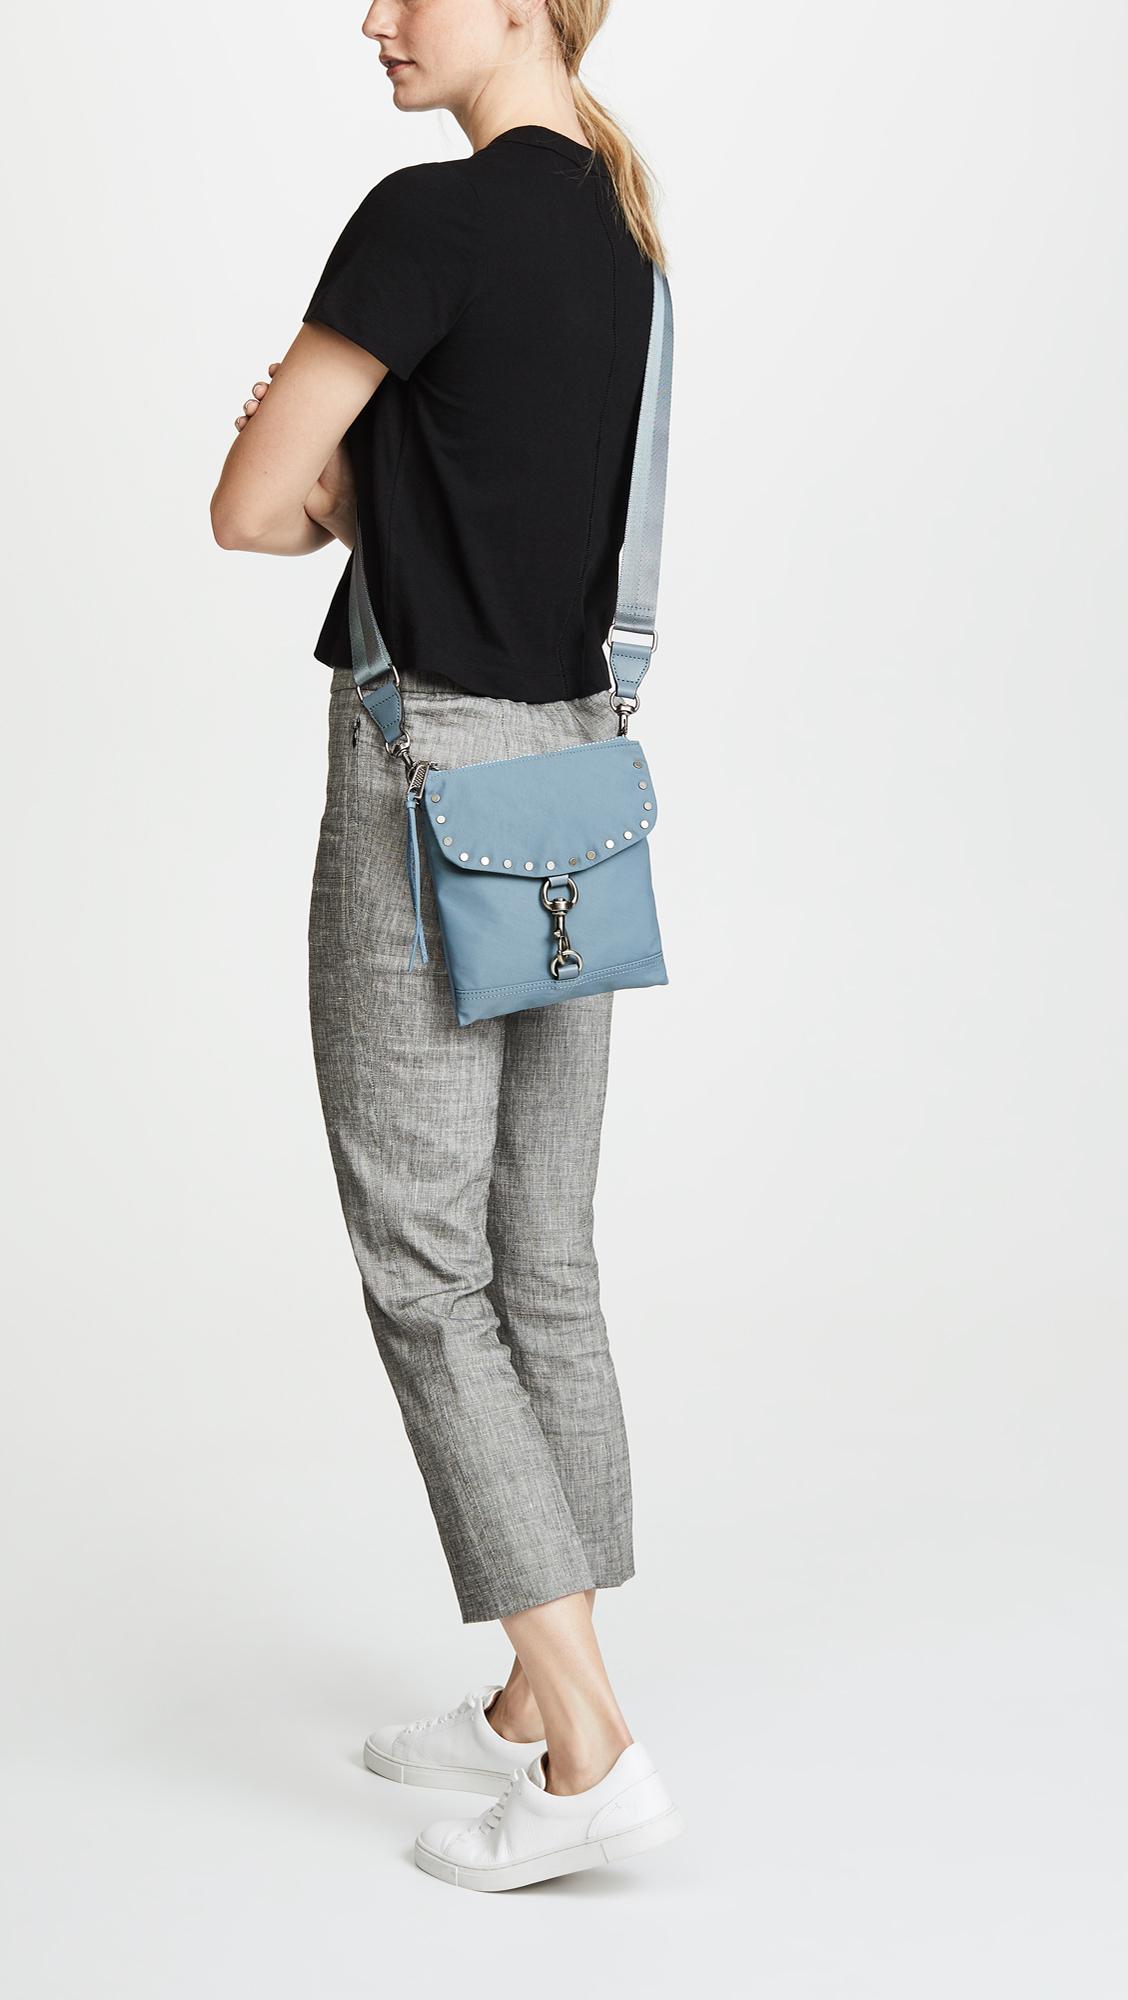 41c549c3f Rebecca Minkoff Nylon Flap Cross Body Bag | SHOPBOP